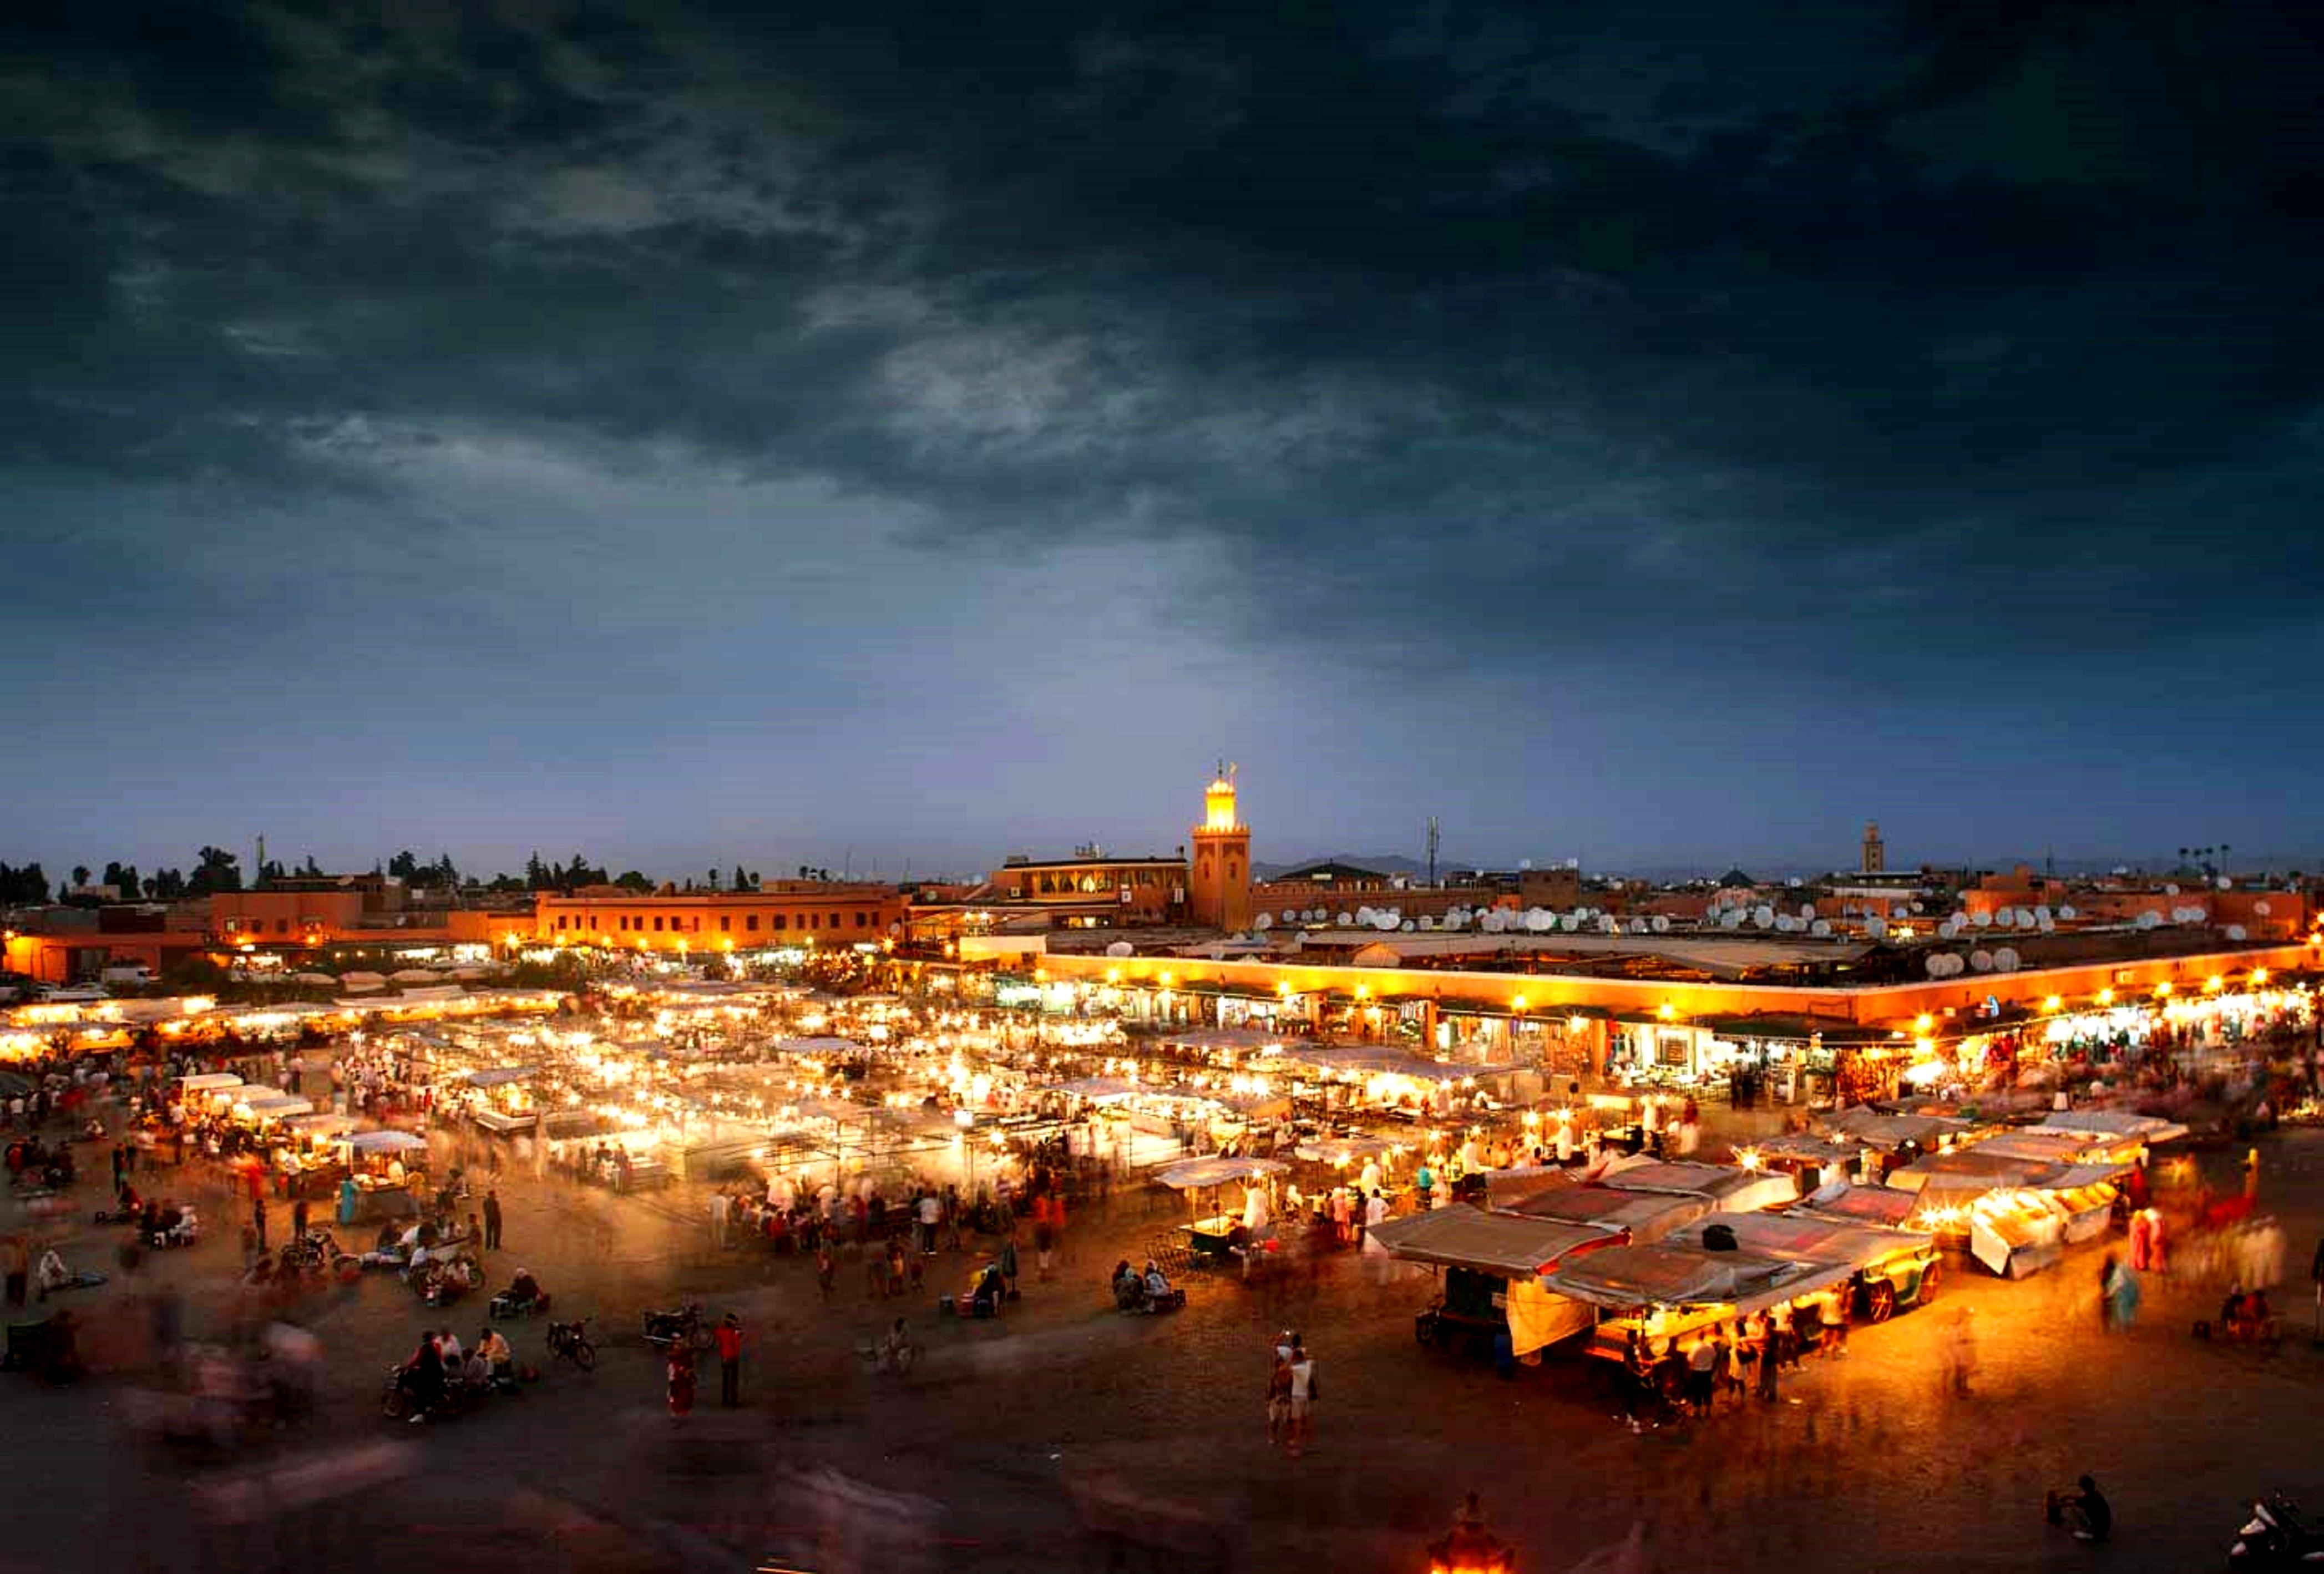 Marrakech - Jāmiʿ el-Fnā